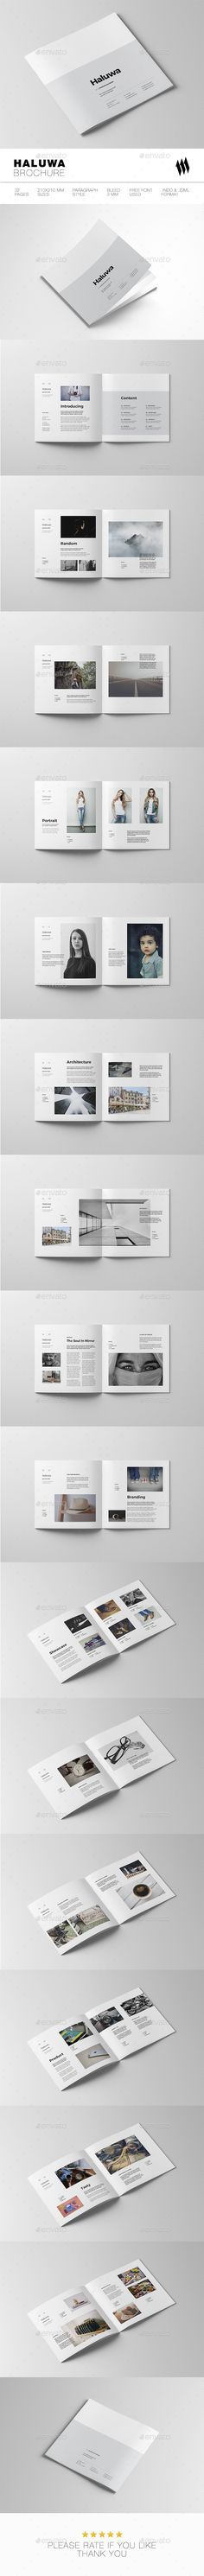 Haluwa Square Brochure — InDesign INDD #brochure #8.26x8.26 • Download ➝ https://graphicriver.net/item/haluwa-brochure/19077735?ref=pxcr